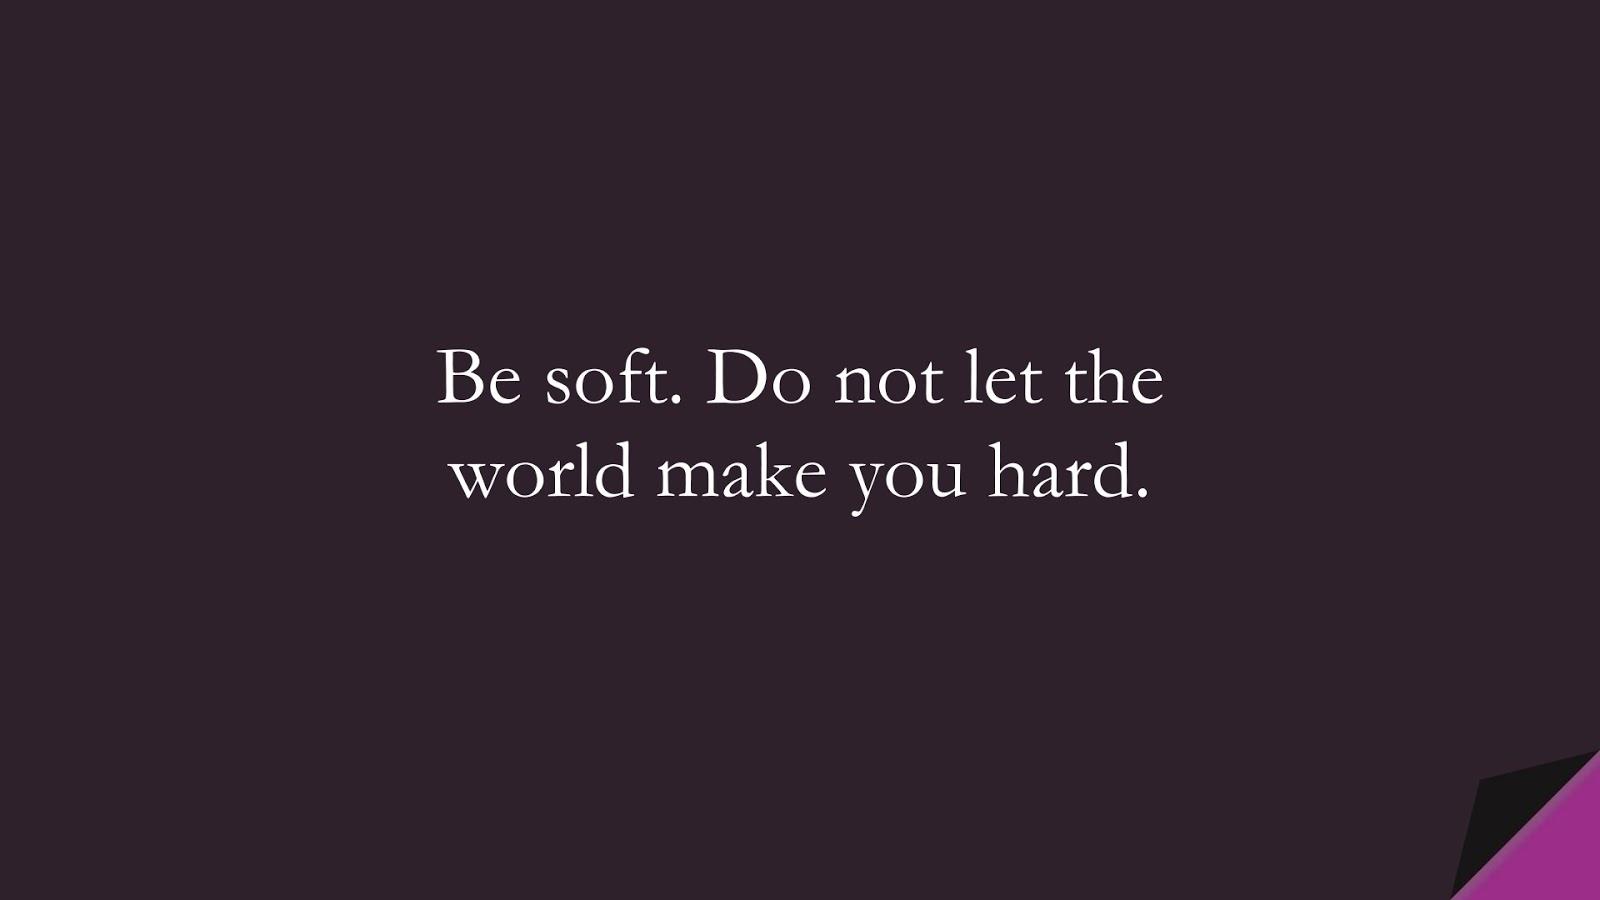 Be soft. Do not let the world make you hard.FALSE